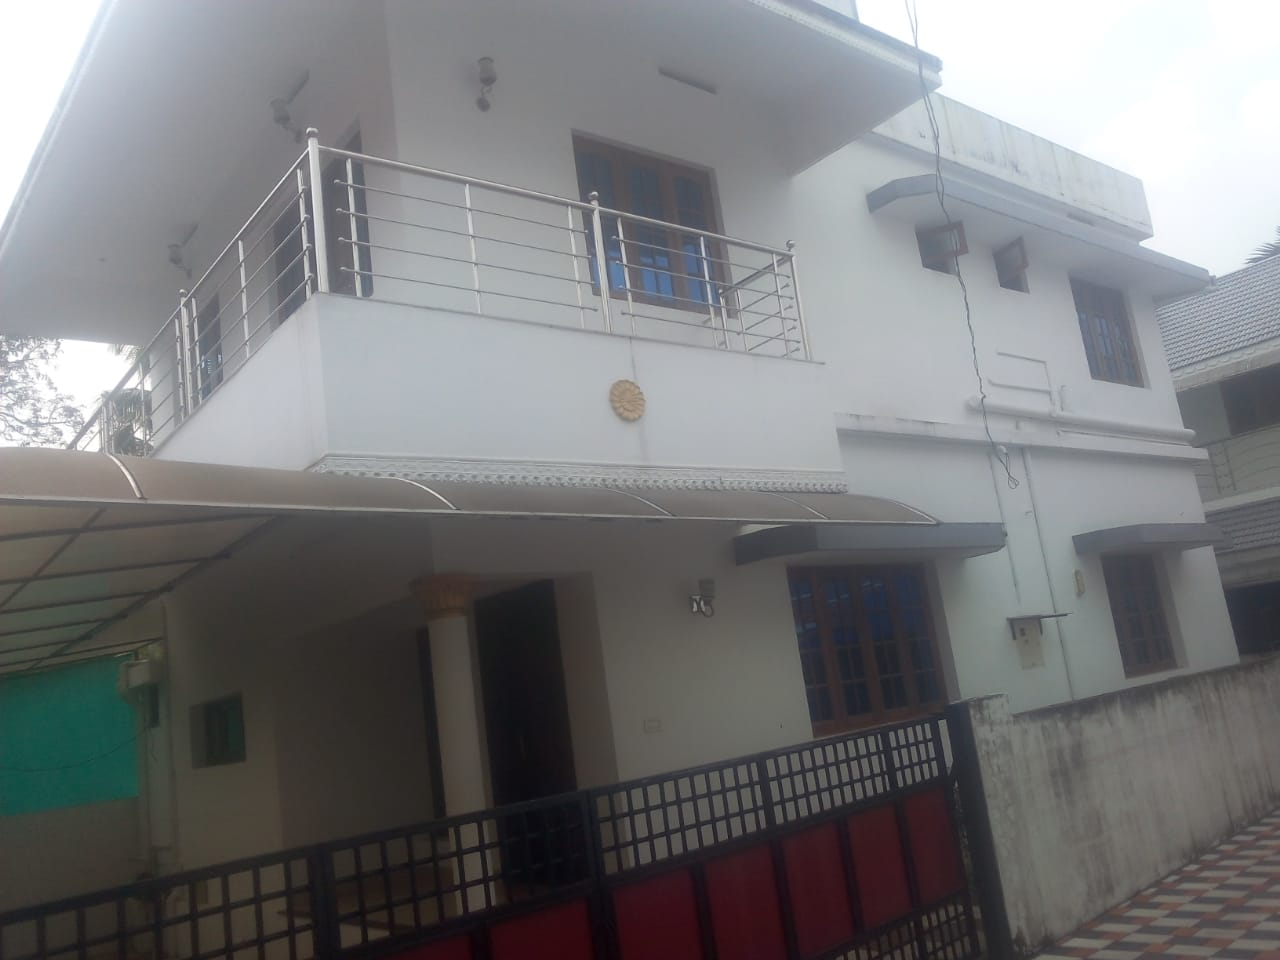 4 Bedroom Villa for Rent in Vytila Edapally Road, Ernakulam